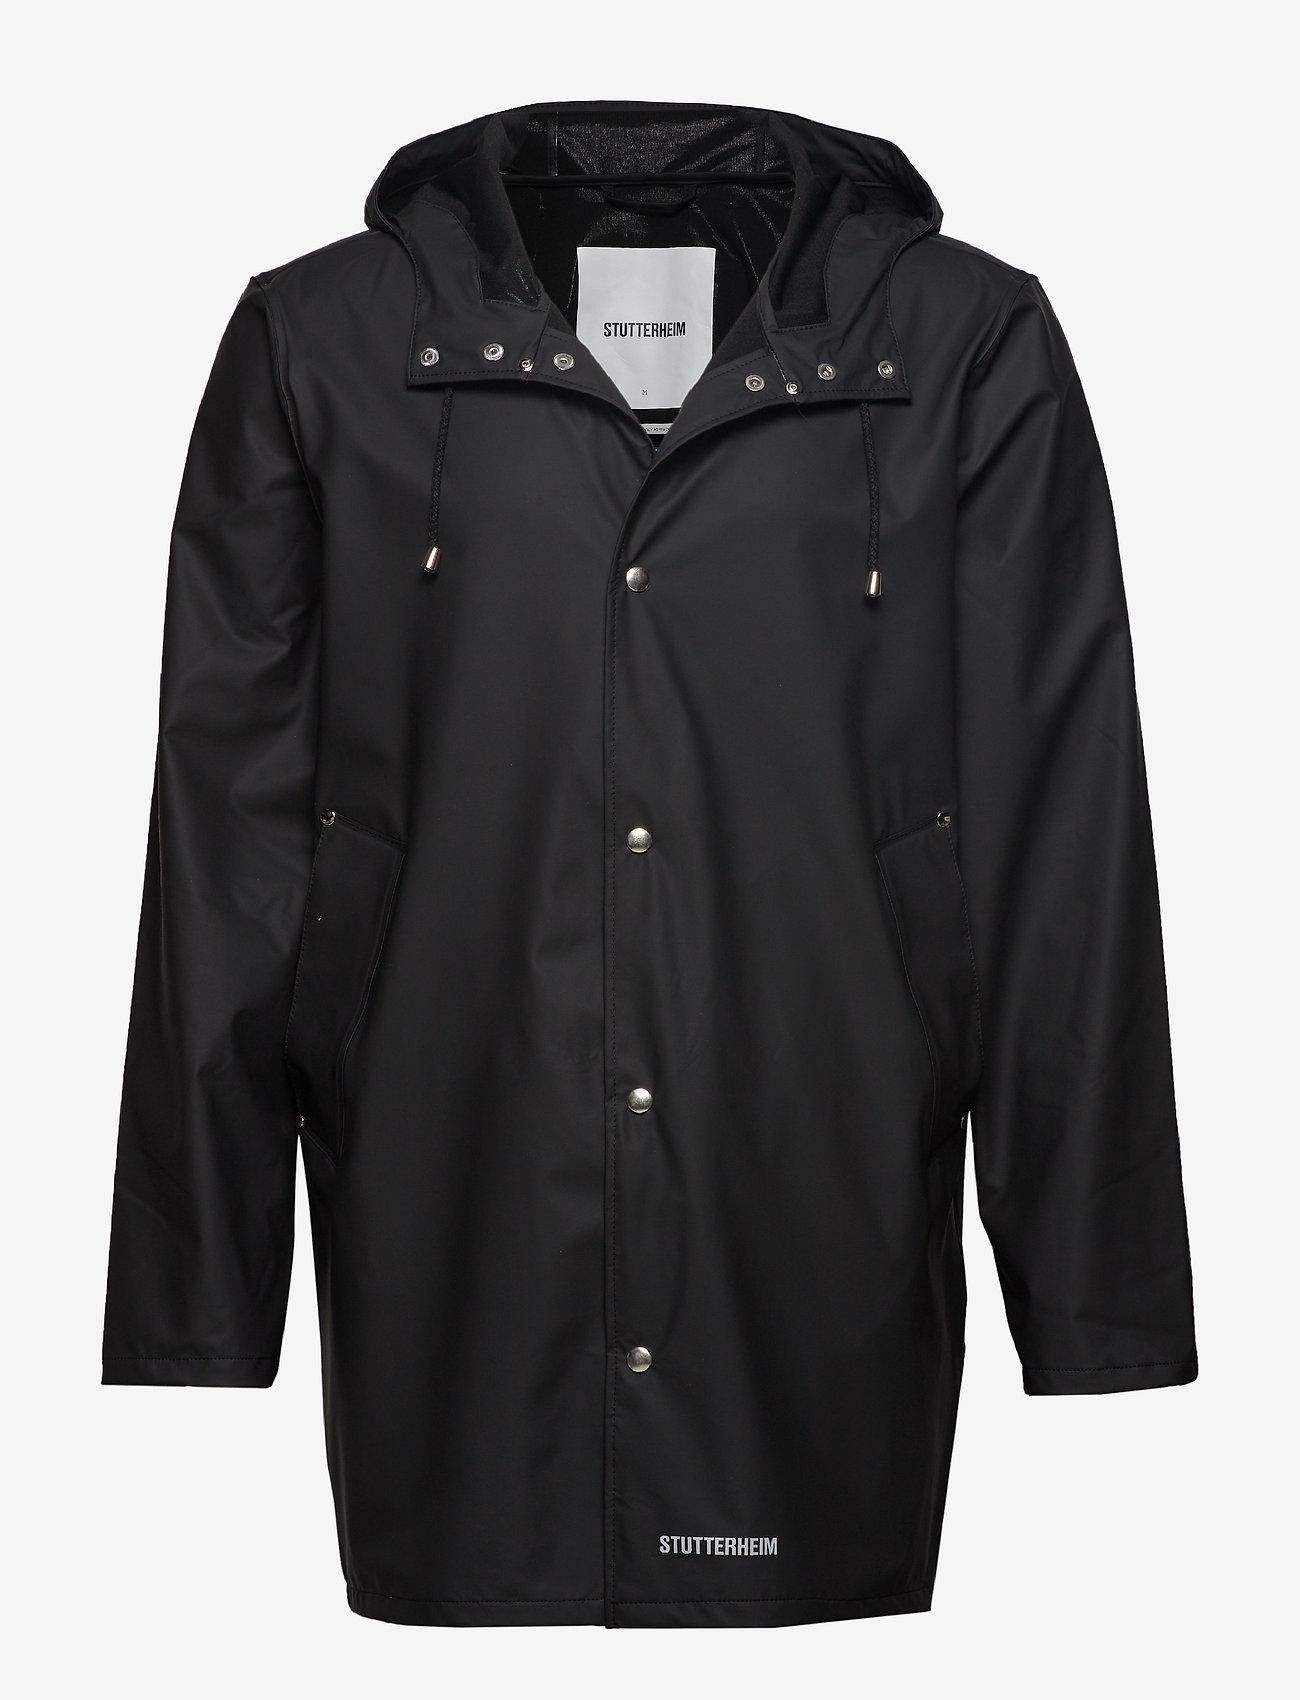 Stutterheim - Stockholm LW - rainwear - black - 1